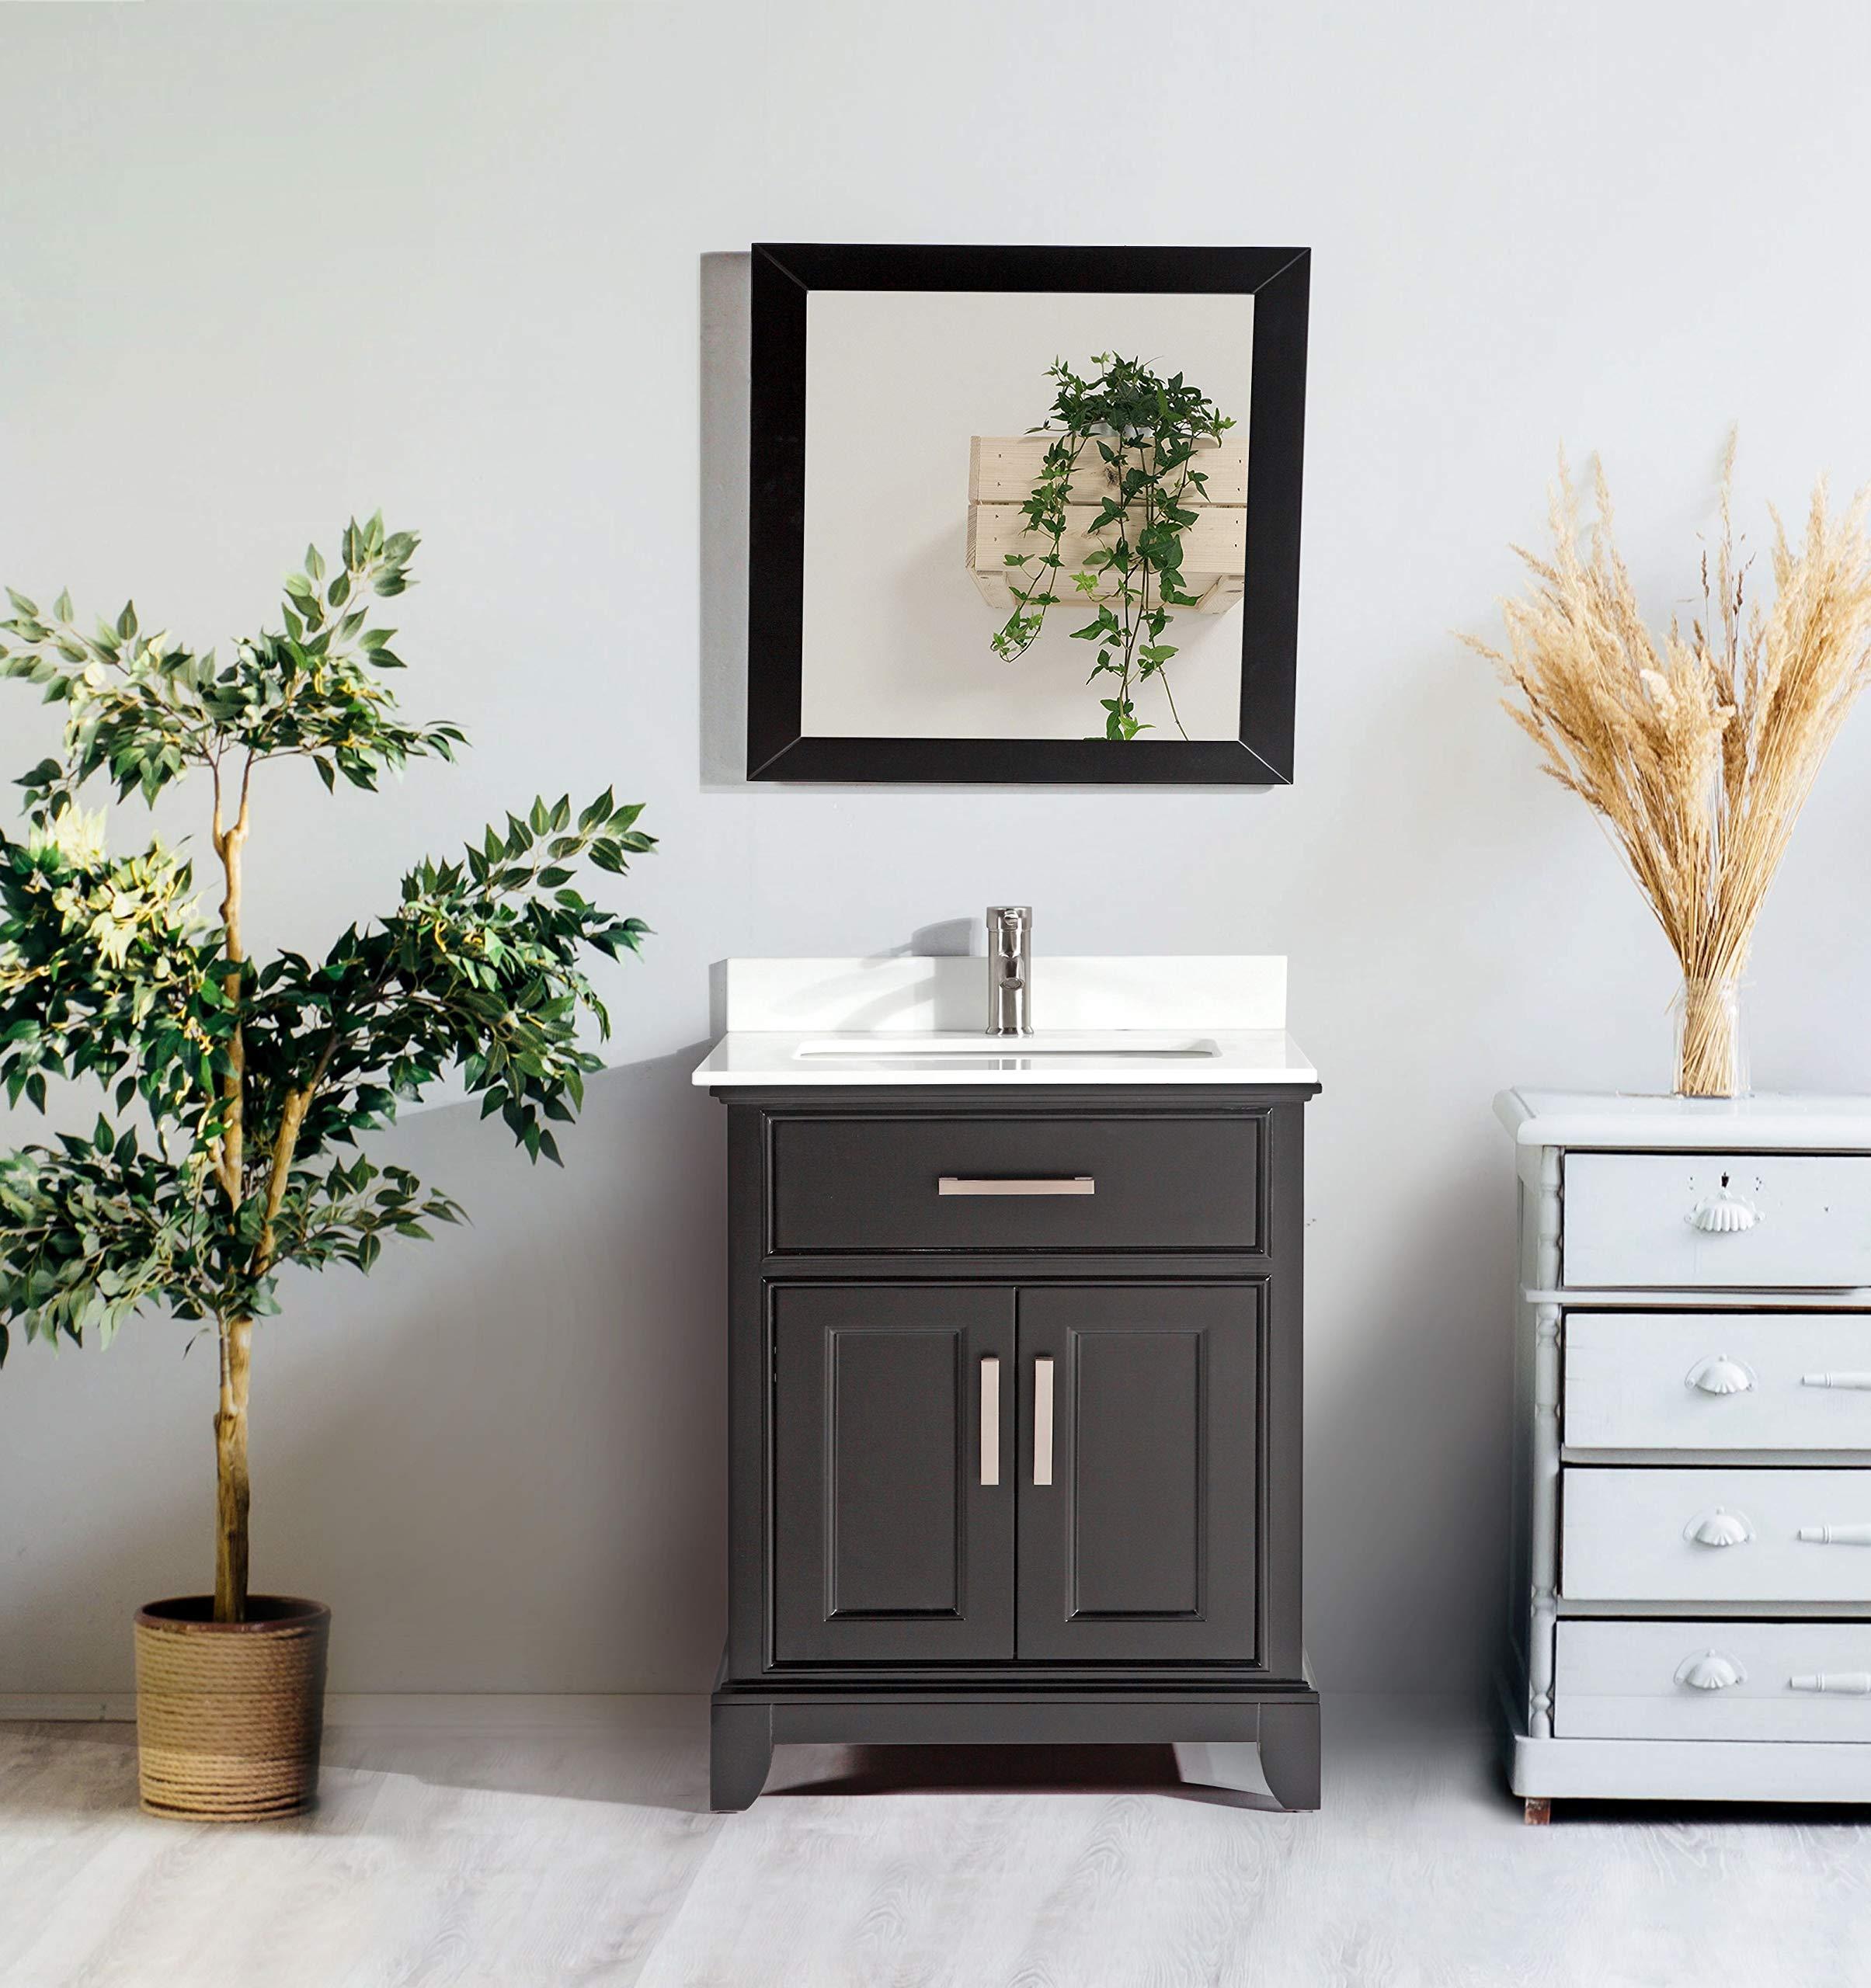 Vanity Art Bathroom Vanity Set White Super Phoenix Stone Top Soft Closing Doors Undermount Rectangle Sink Cabinet With Free Mirror Amazon Com